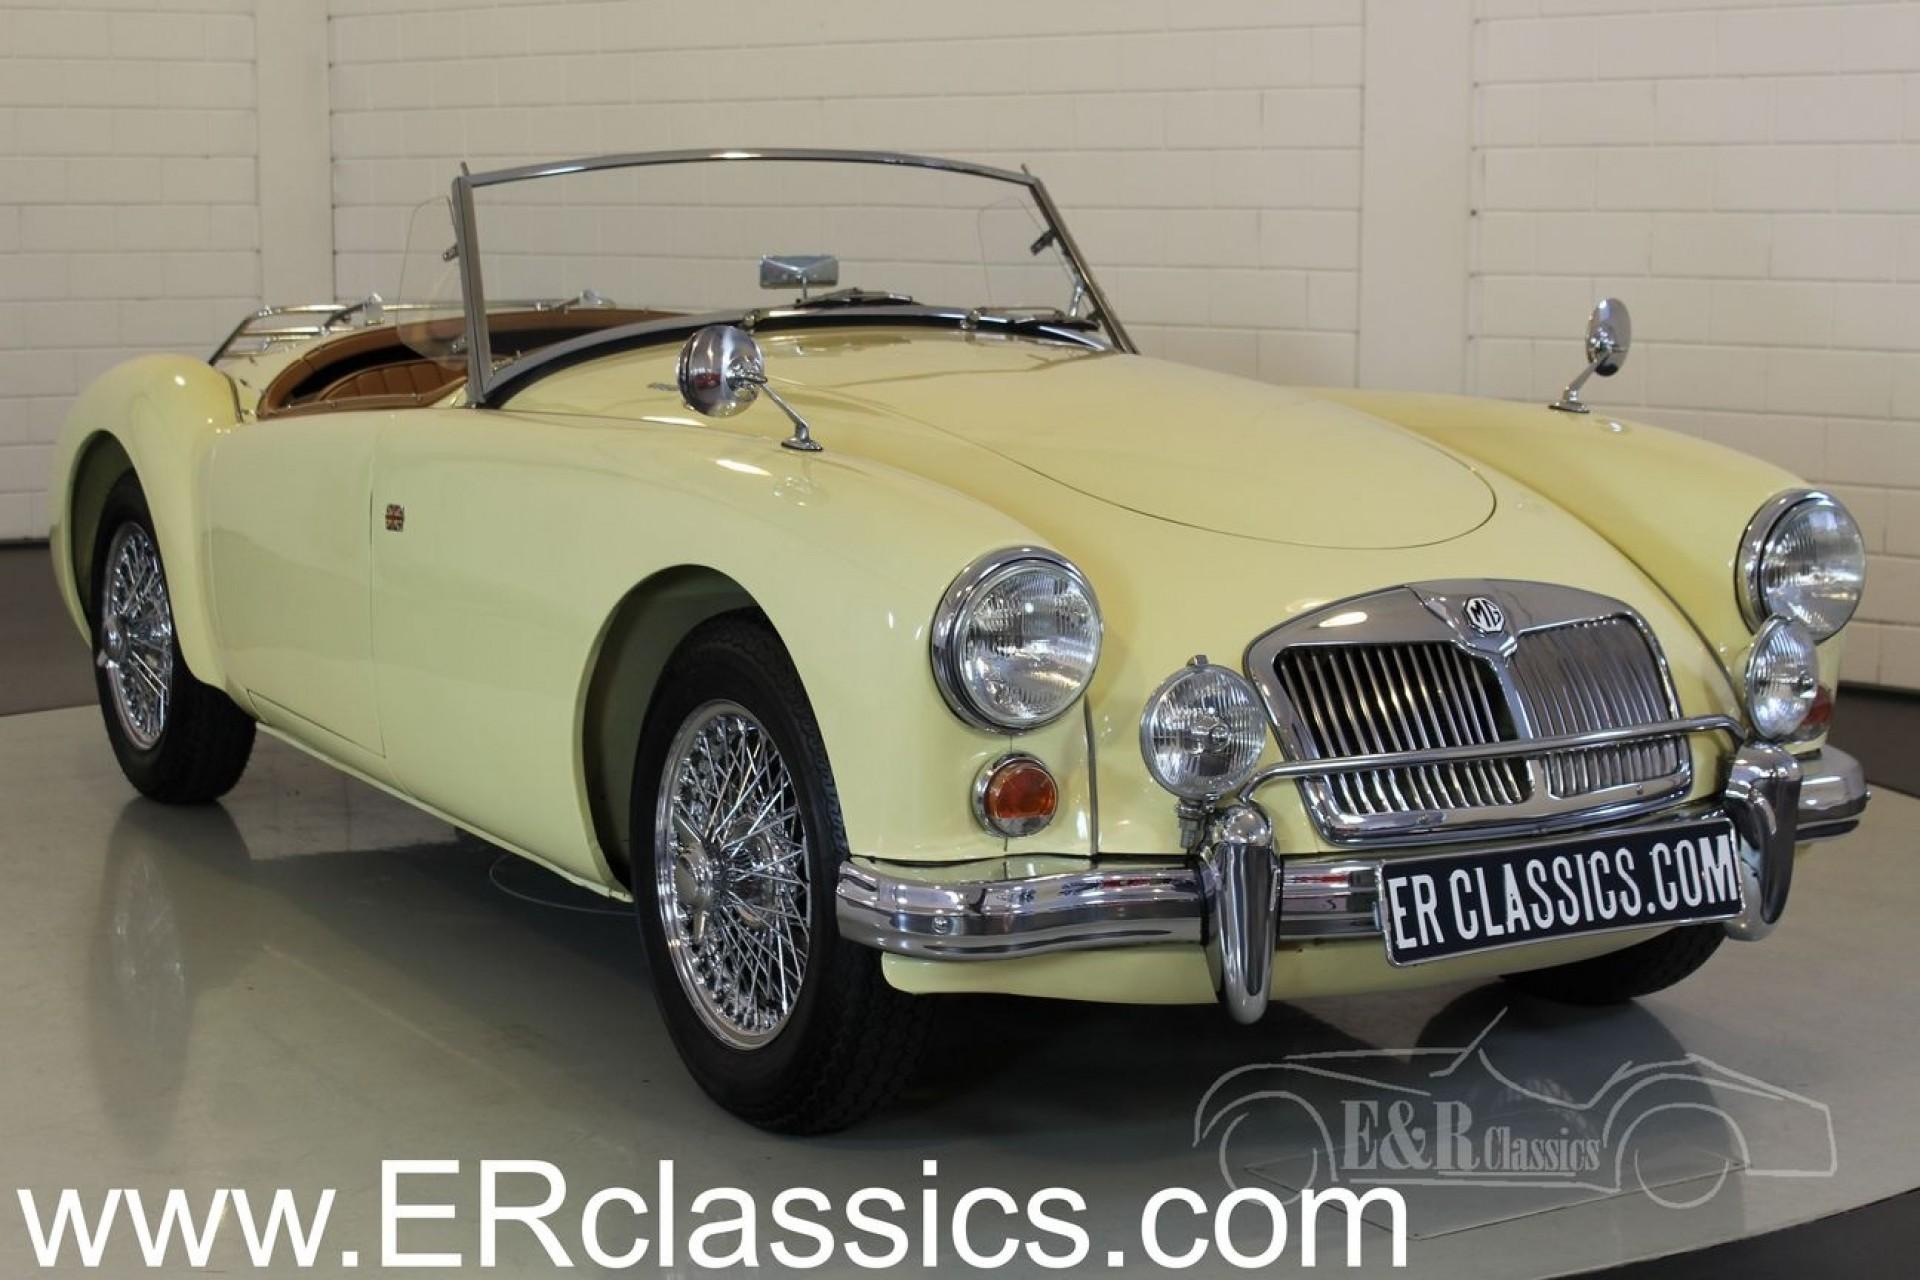 Mg A Vendre : mg a 1600 cabriolet 1959 vendre erclassics ~ Medecine-chirurgie-esthetiques.com Avis de Voitures